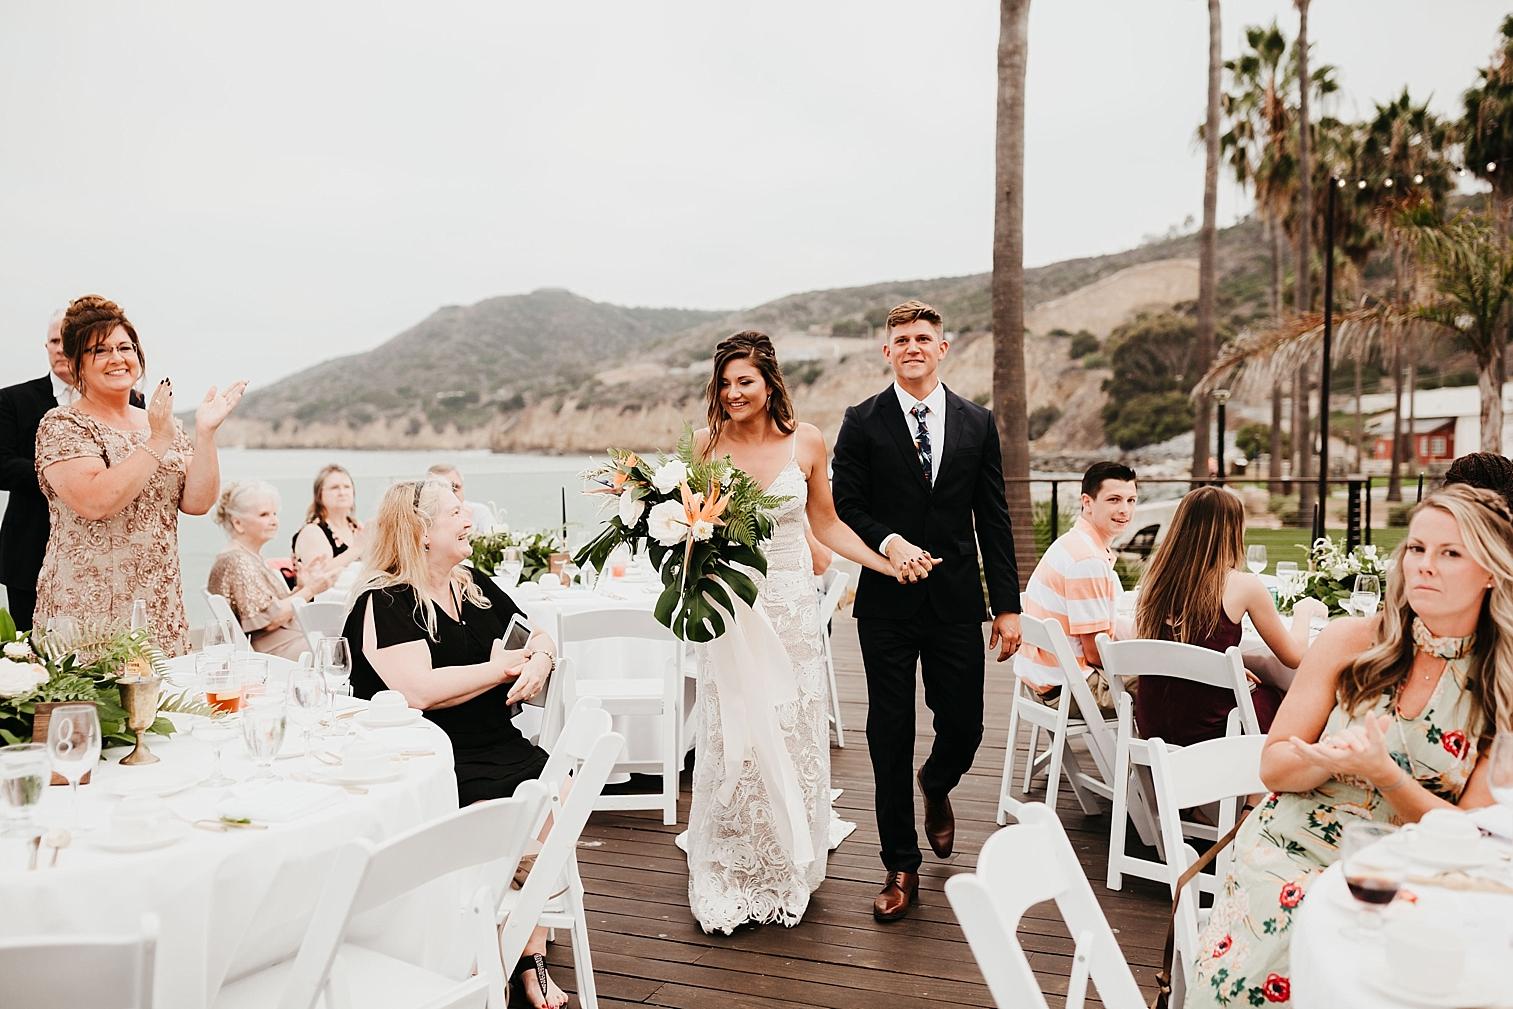 Point-Loma-Oceanview-Room-Wedding-109.jpg